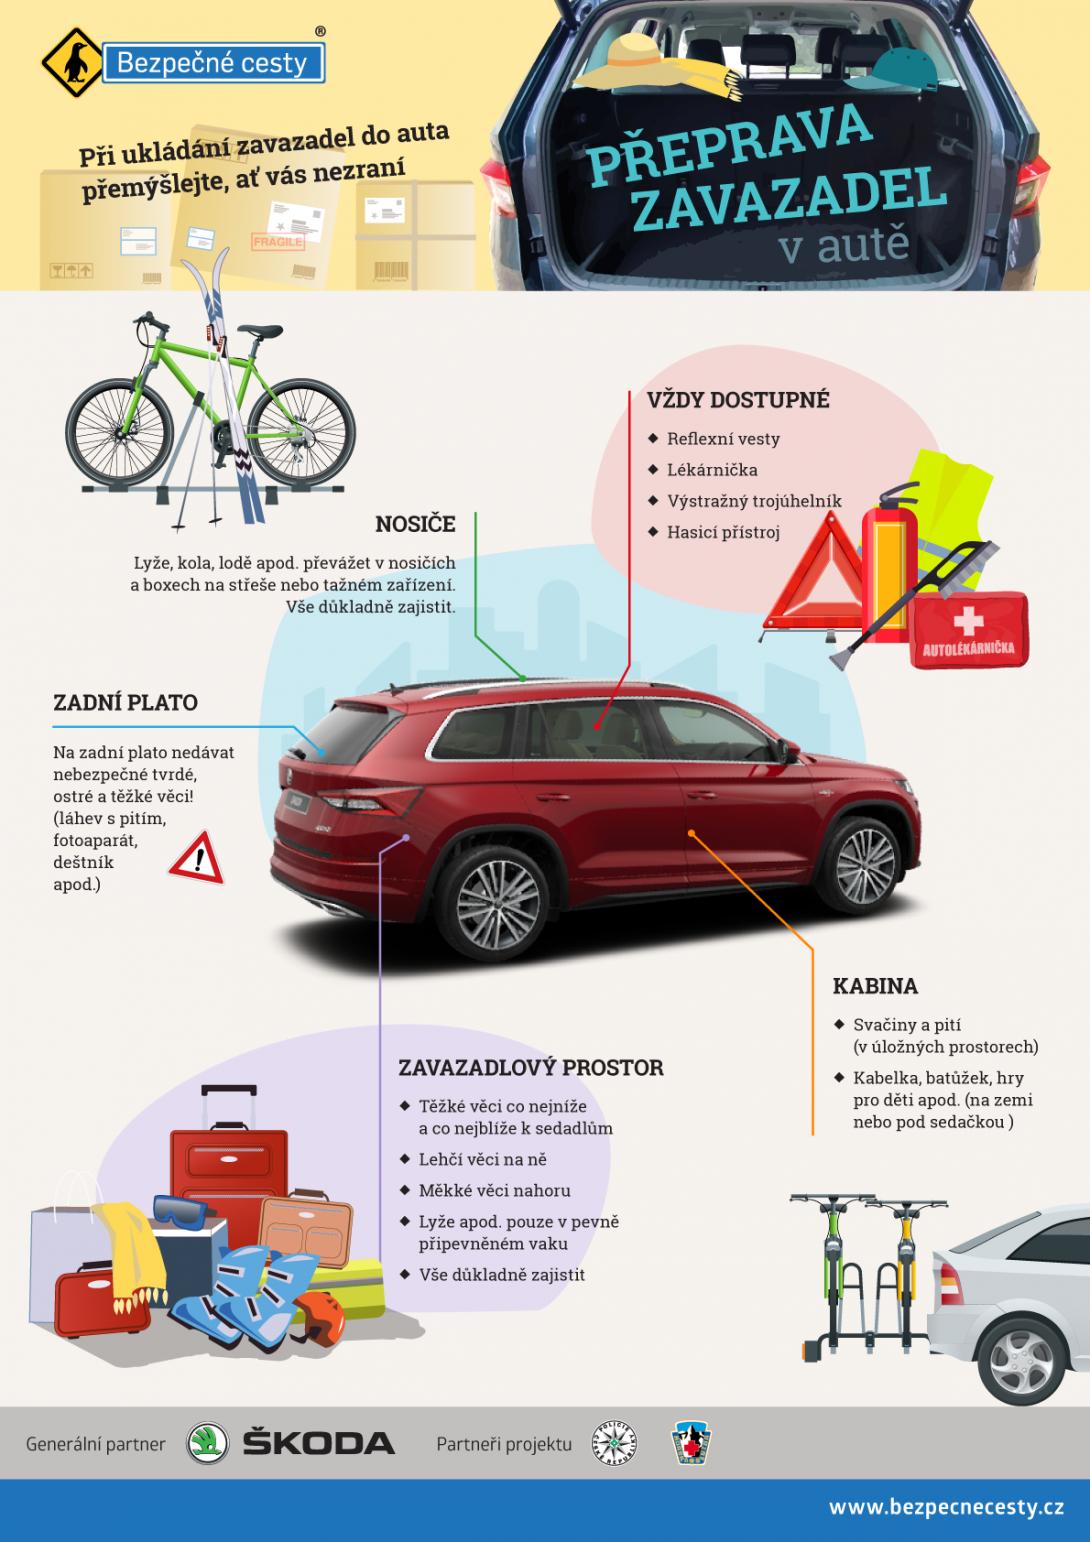 Přeprava zavazadel - infografika